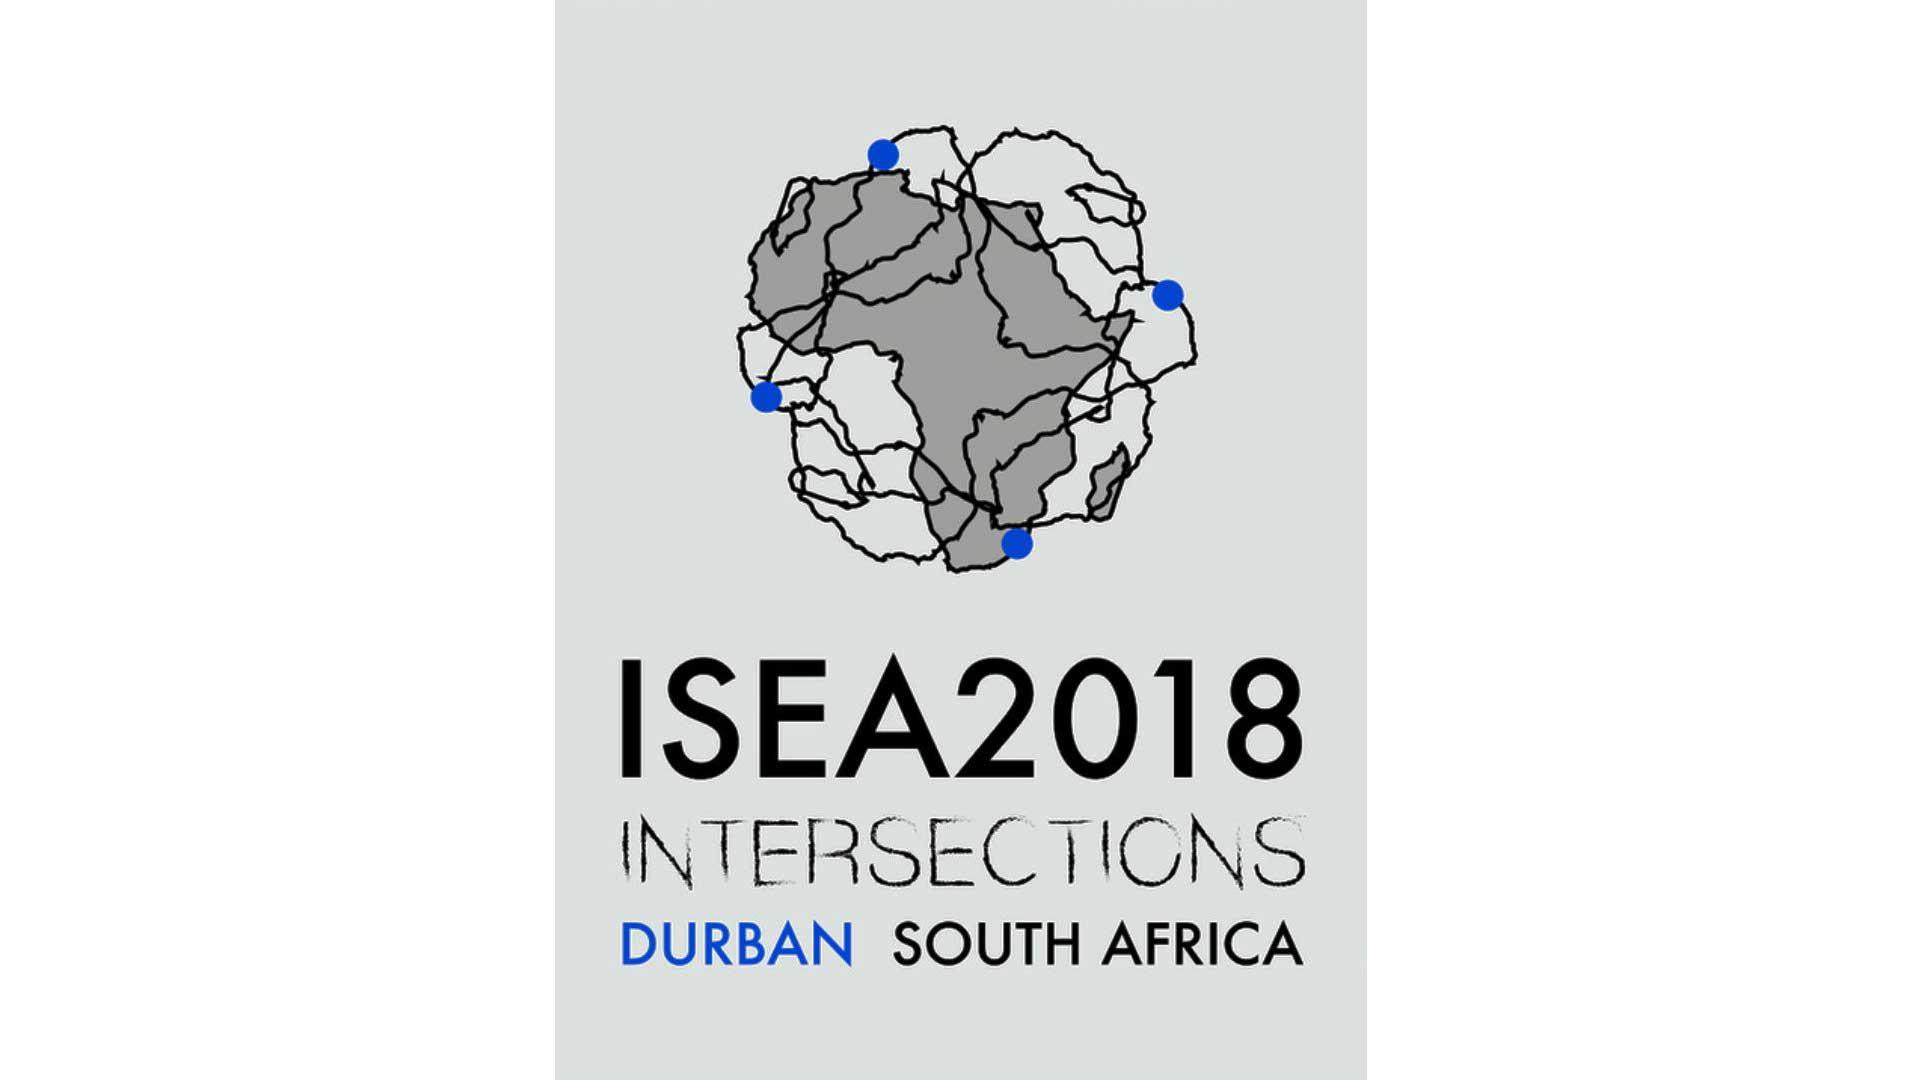 ISEA 2018